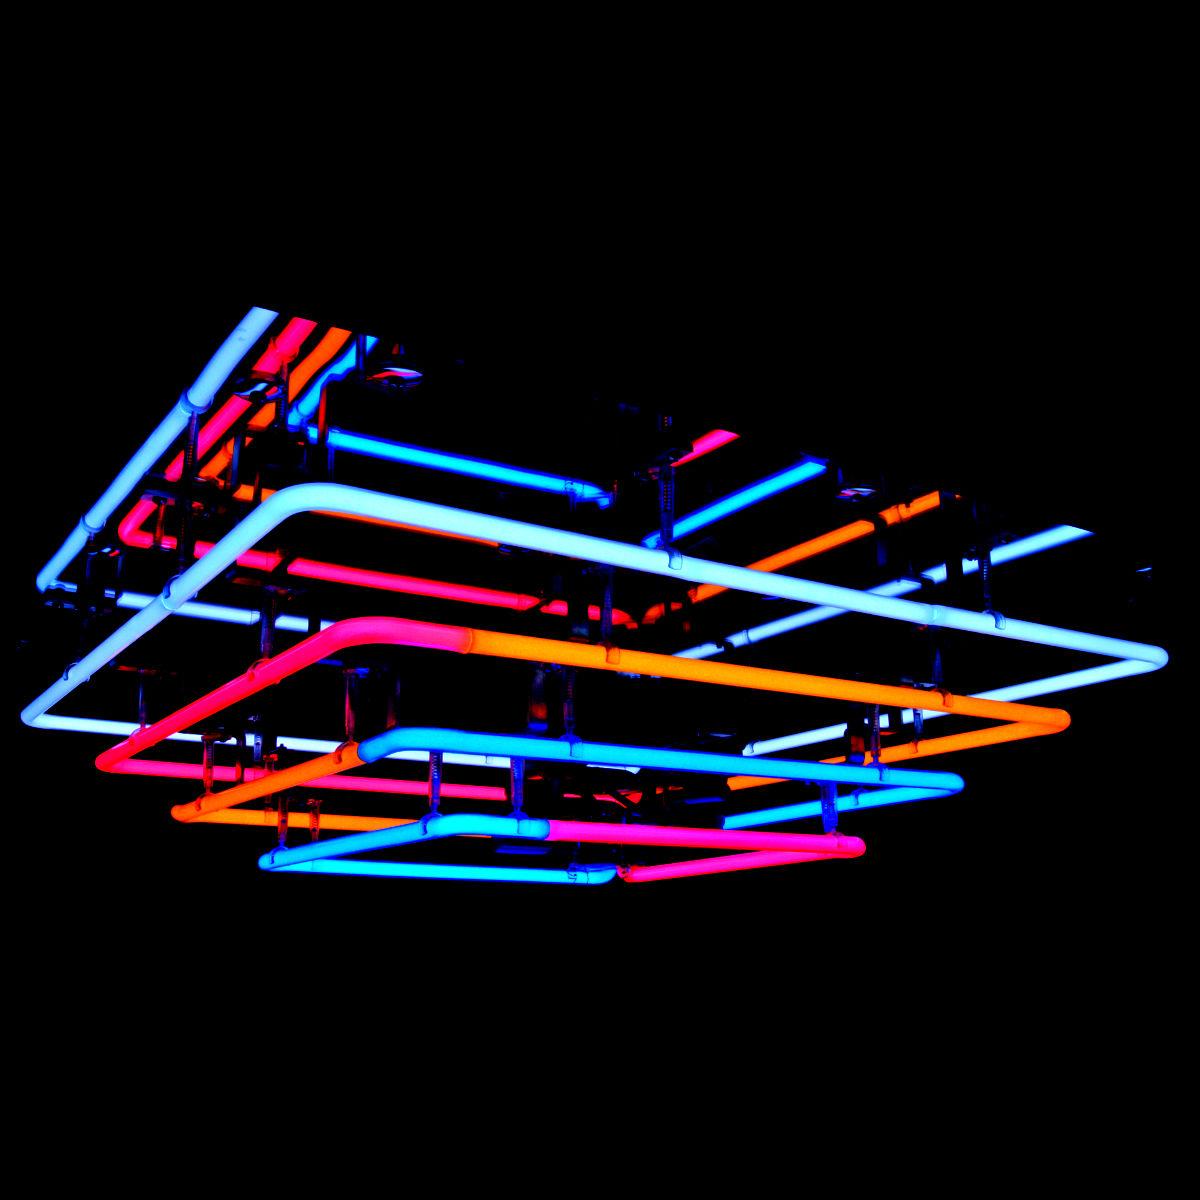 Designer Mirrored Neon Chandeliers by John Barton - Famous USA Neon Light Sculptor